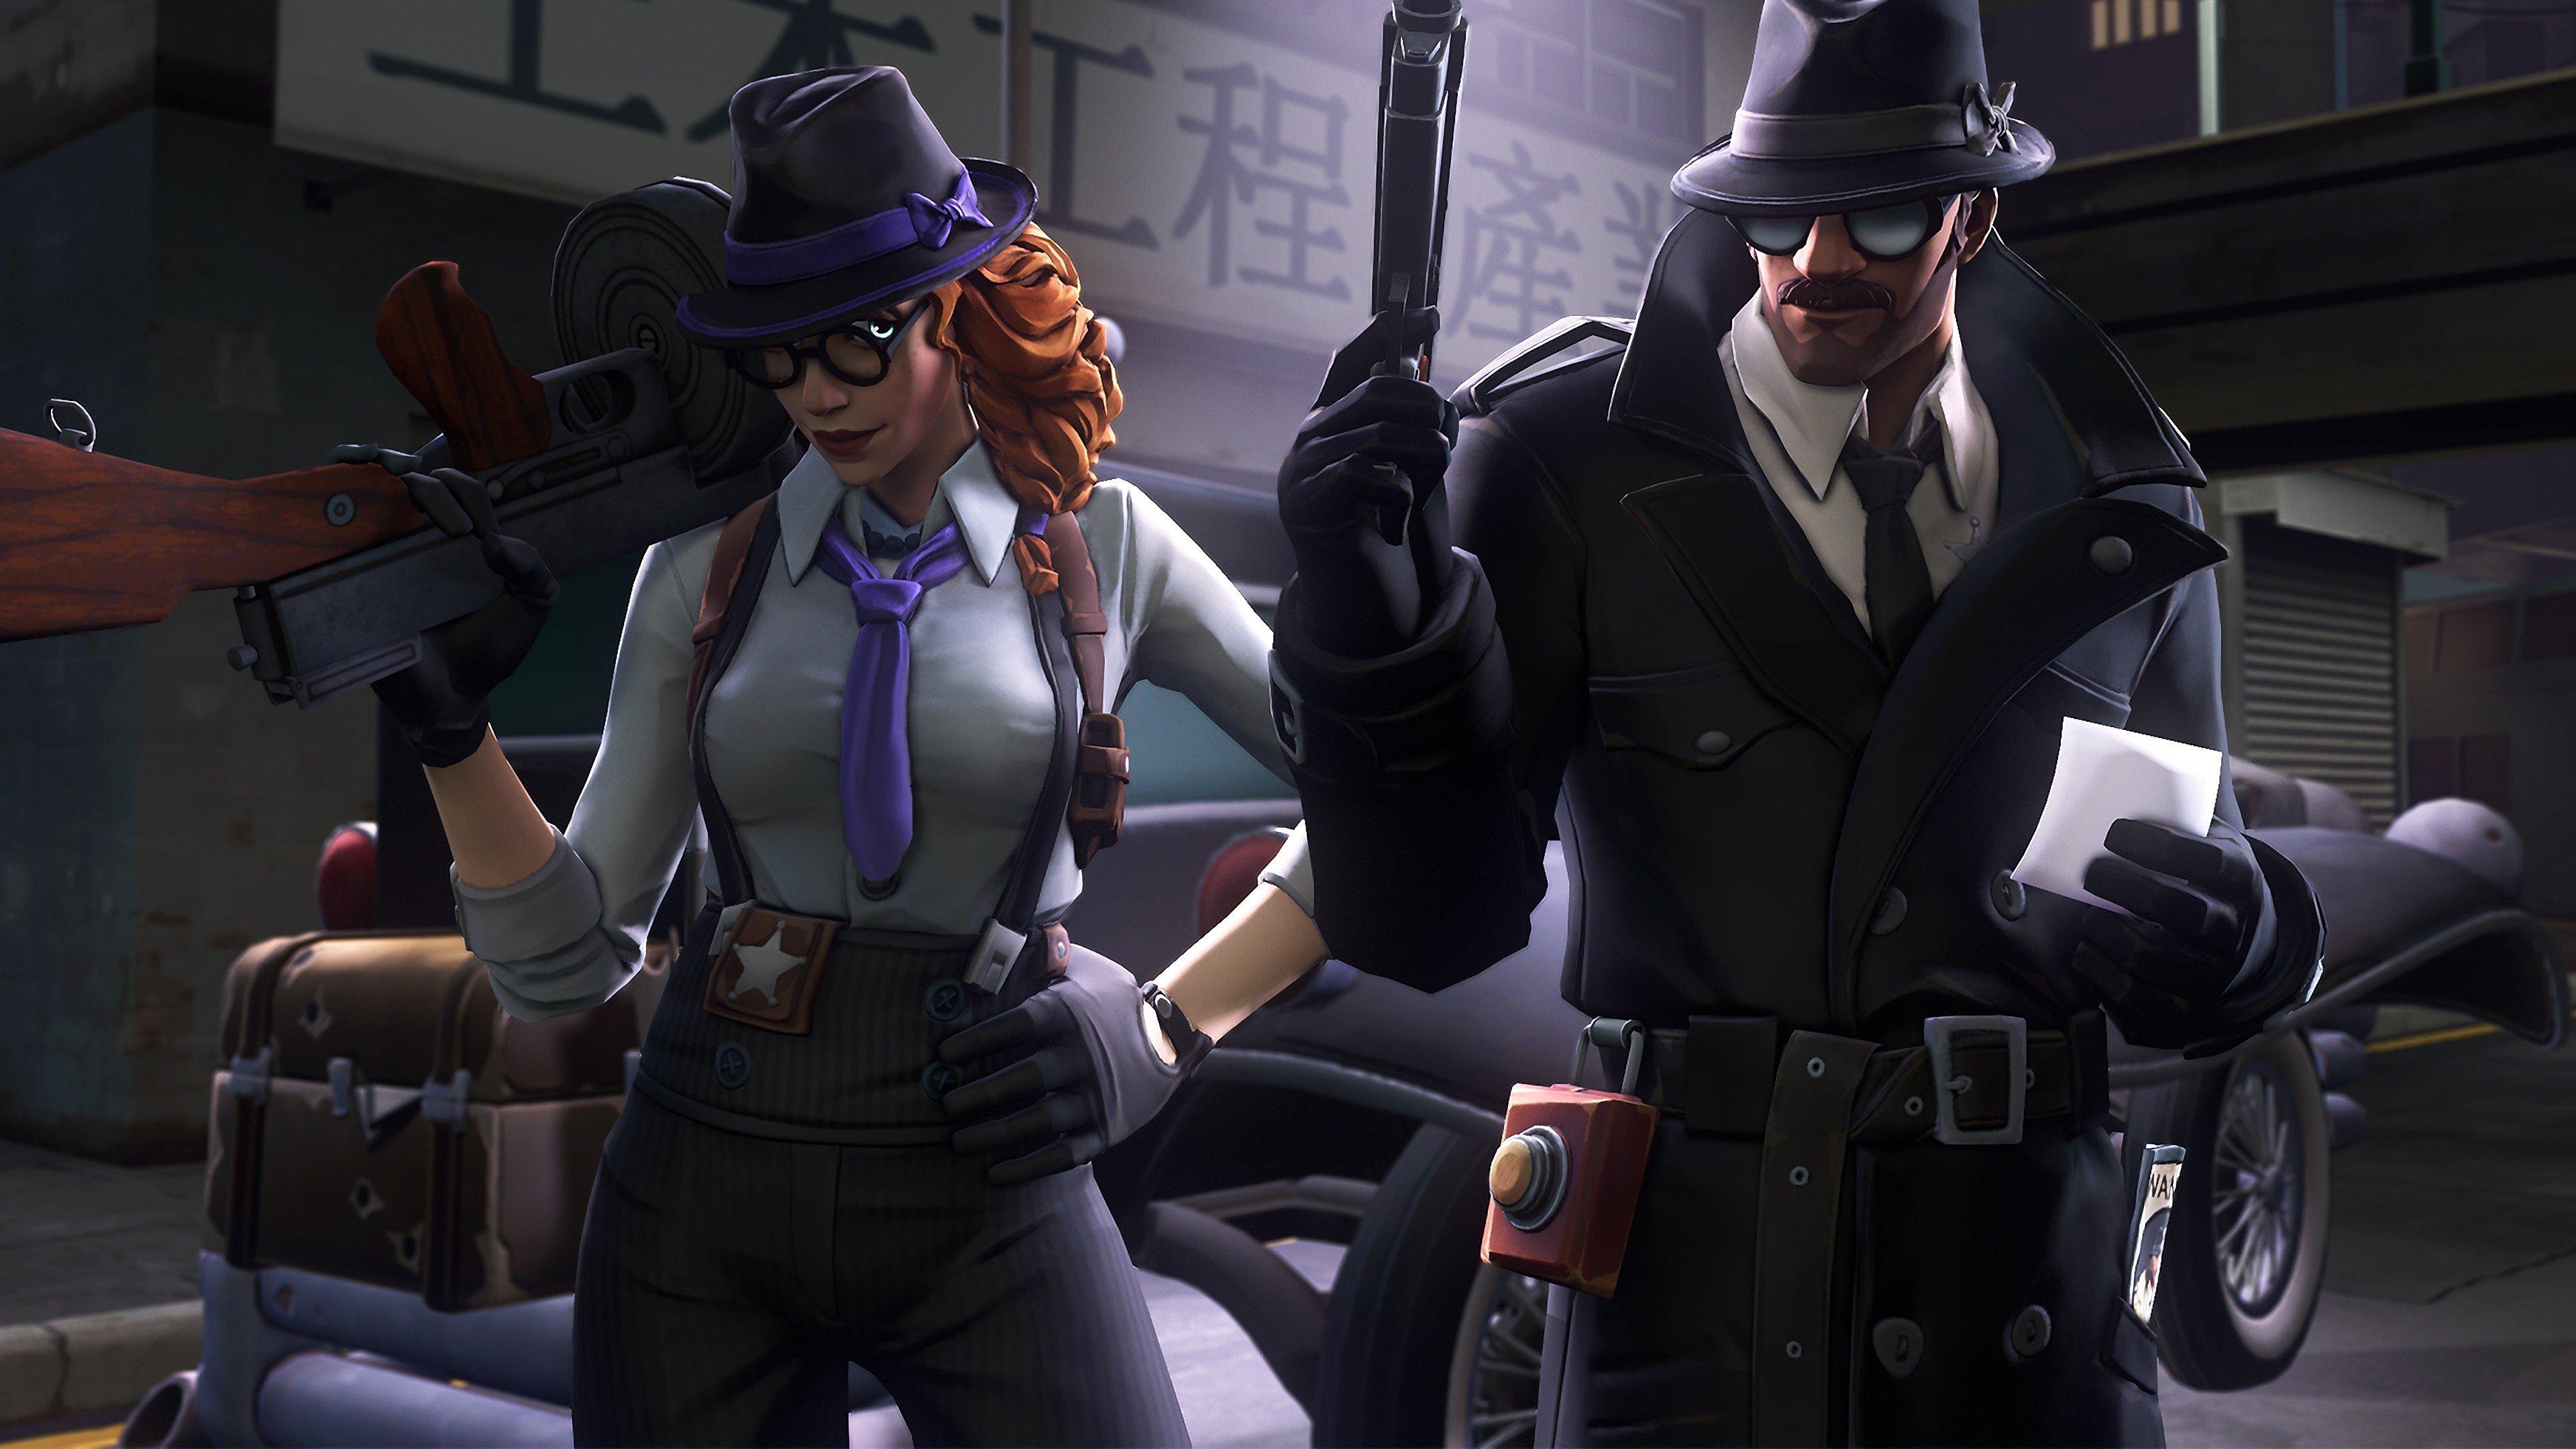 Fondos de pantalla Fortnite Detective Skins